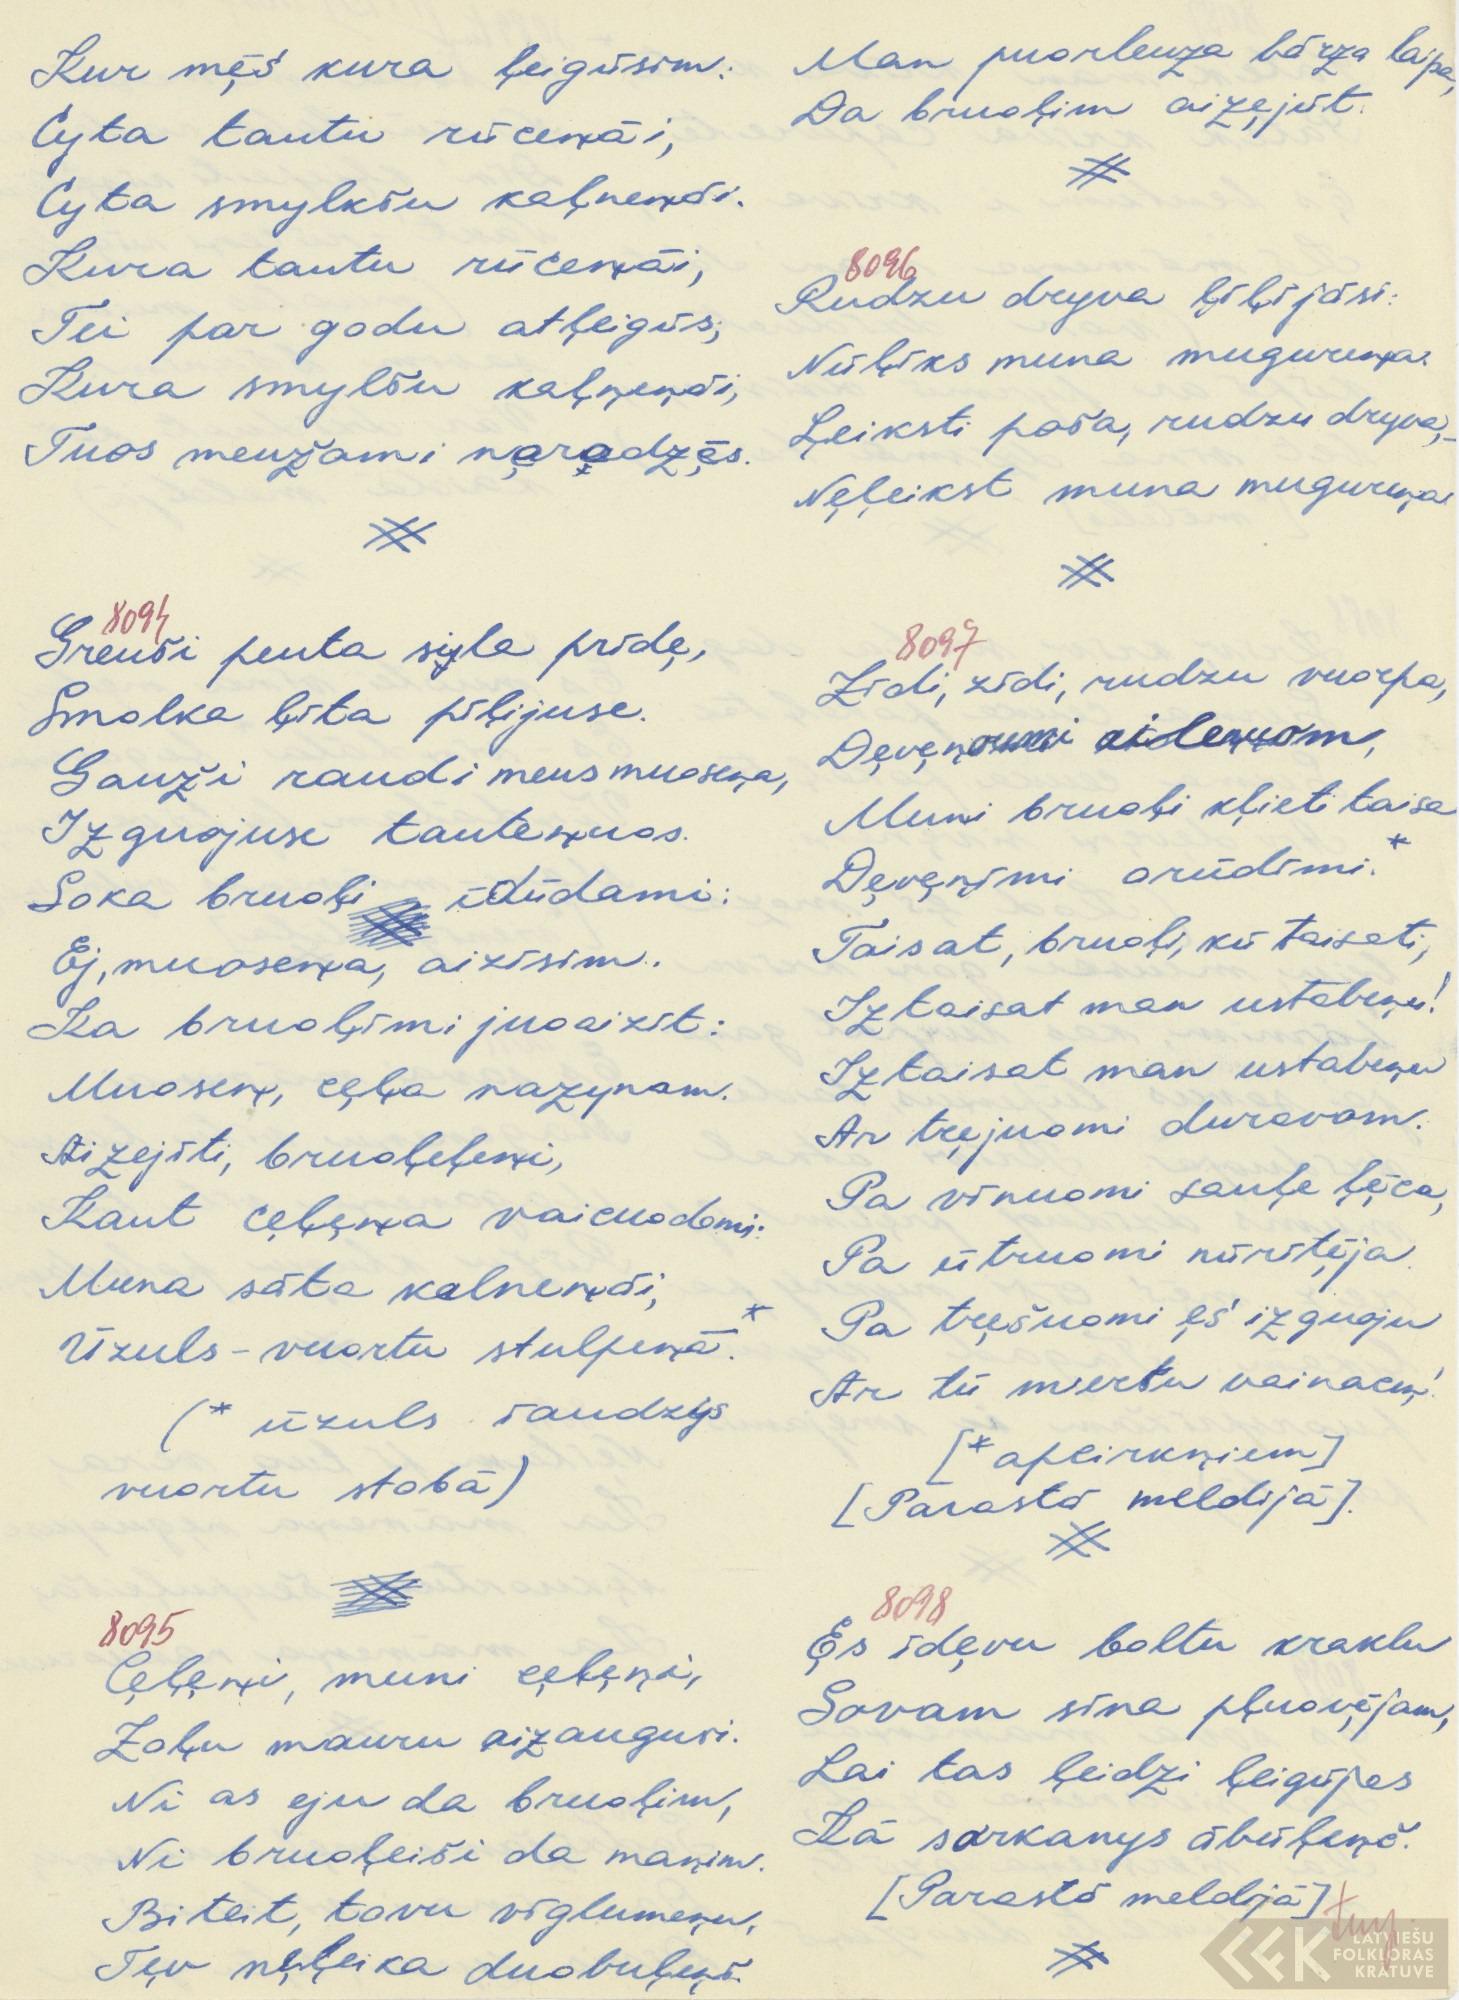 1945-13-zinatniska-ekspedicija-14-0114